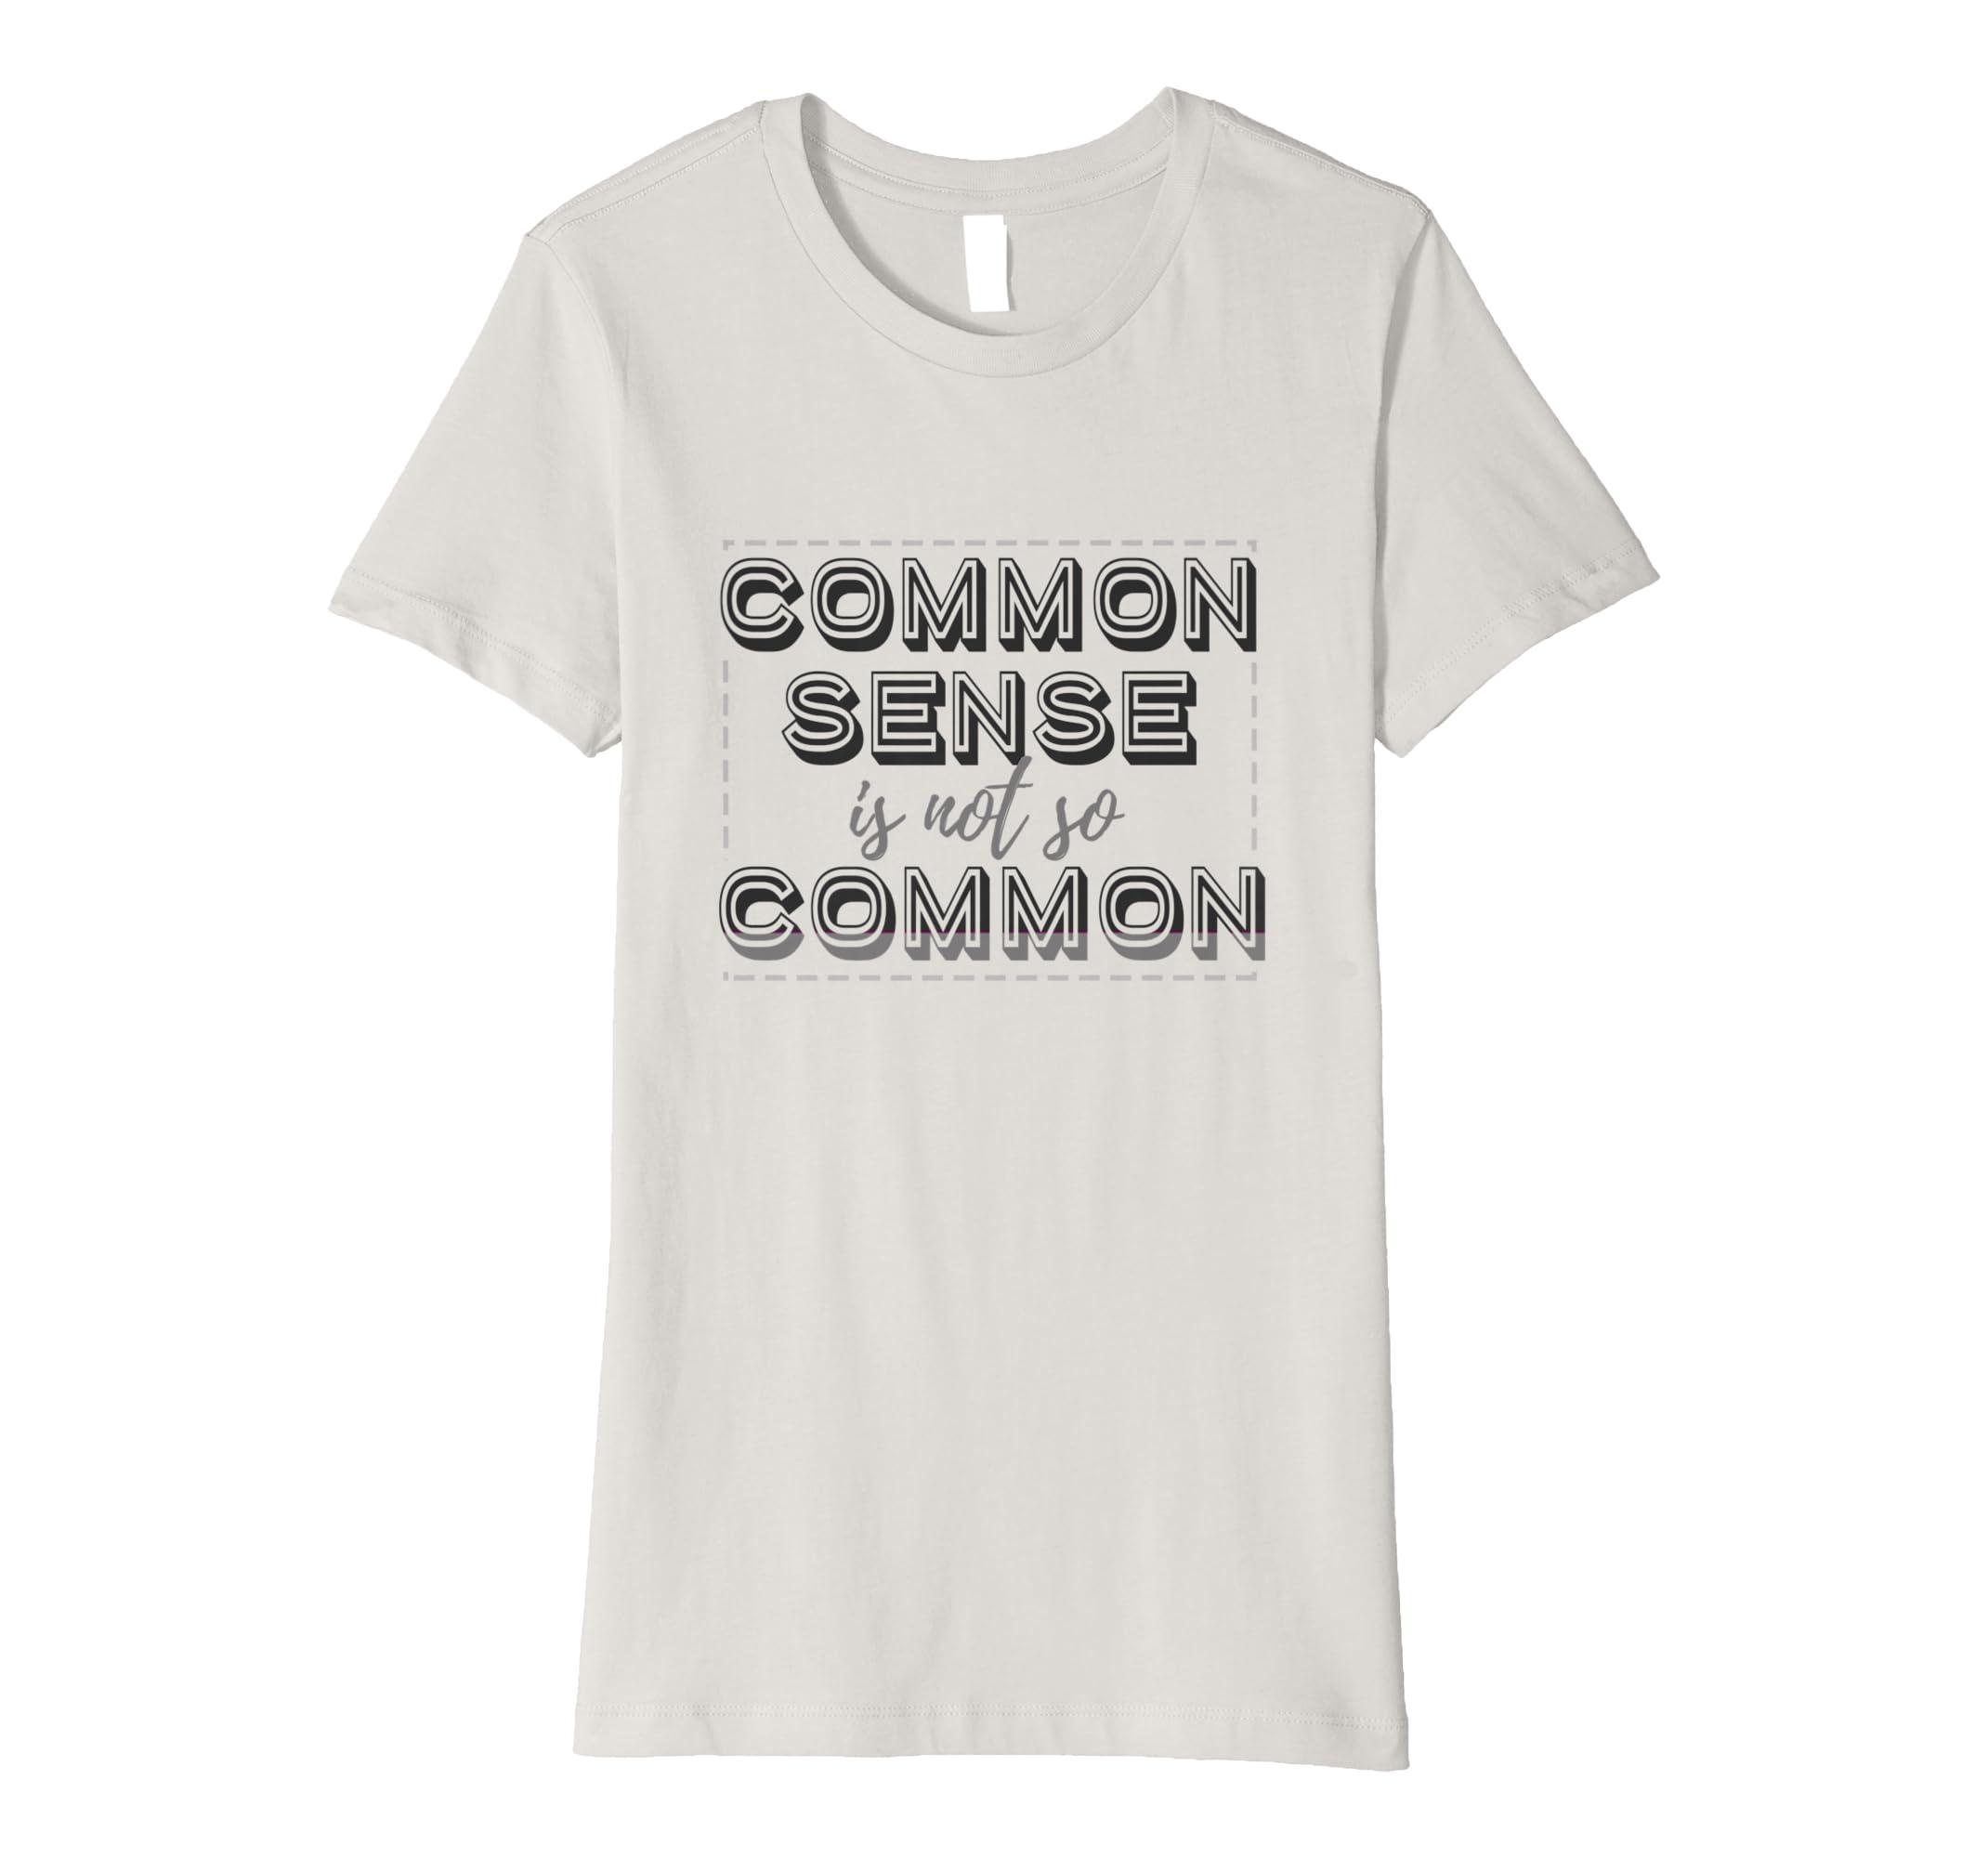 bd17ebb3f9e Amazon.com  Common Sense is Not So Common Soft Tee Shirt Men Women Kids   Clothing